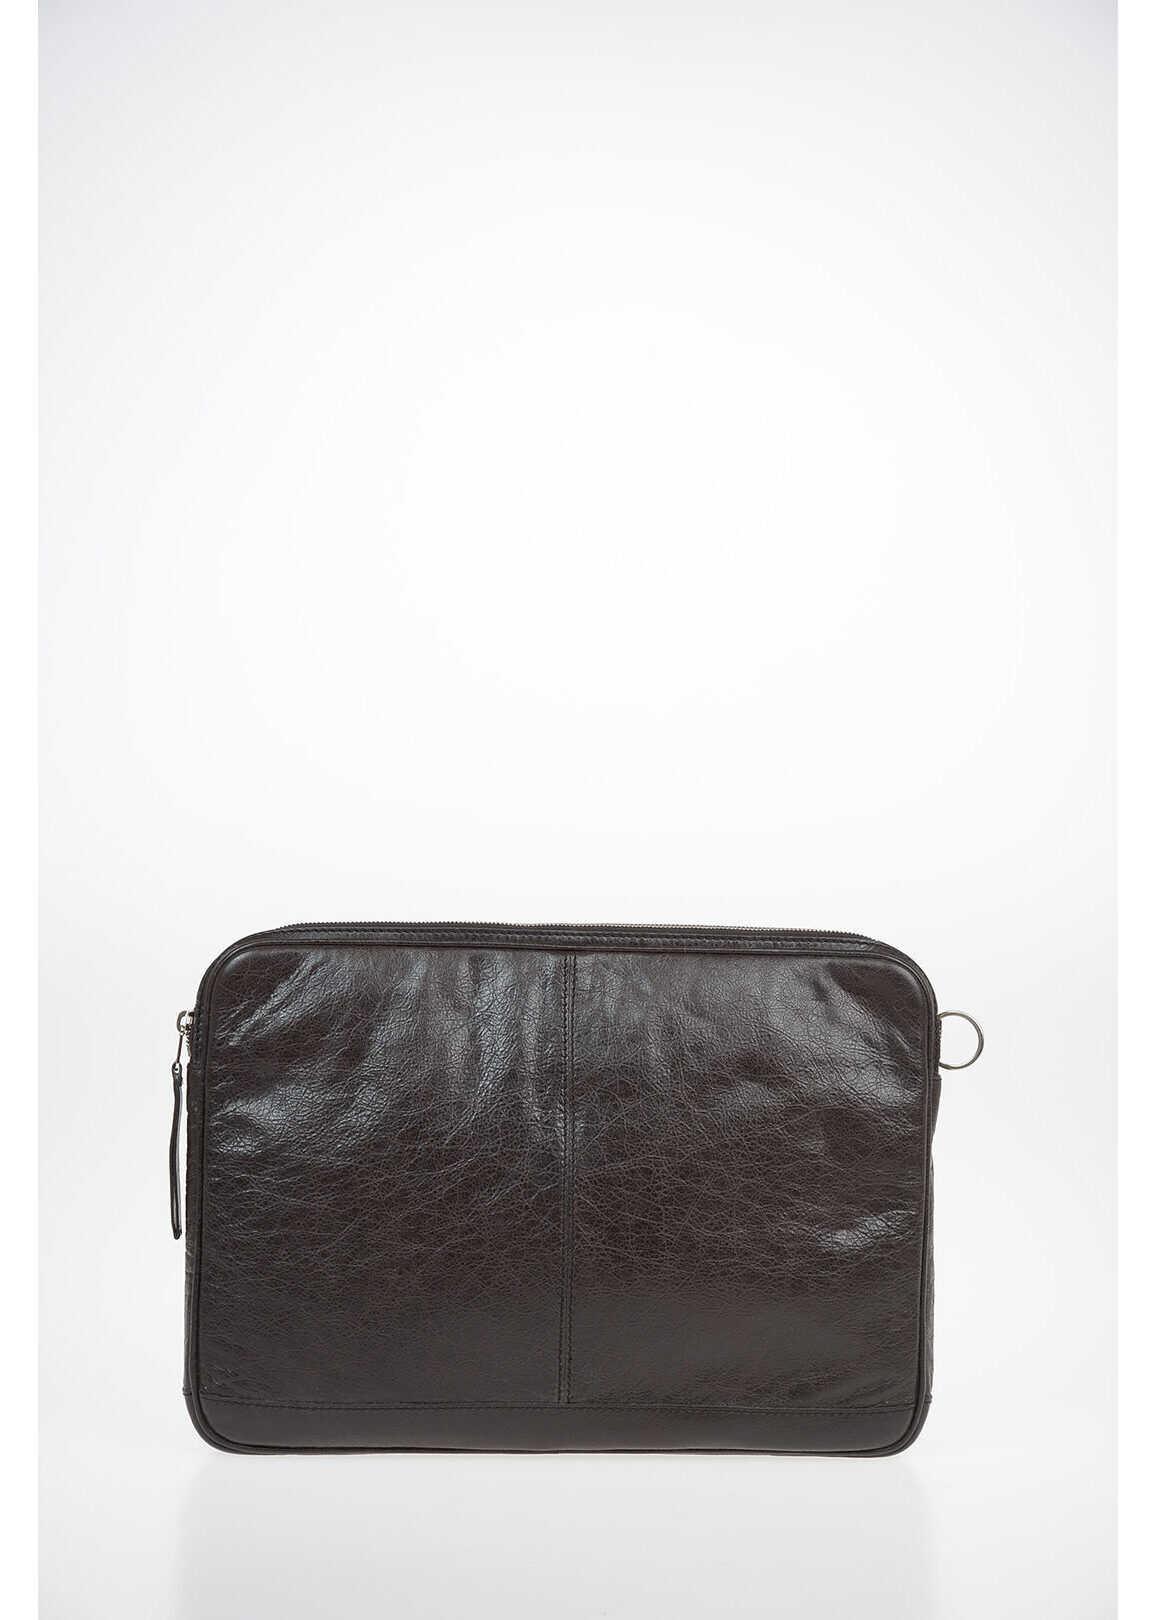 Balenciaga tumbled leather Laptop Bag BROWN imagine b-mall.ro